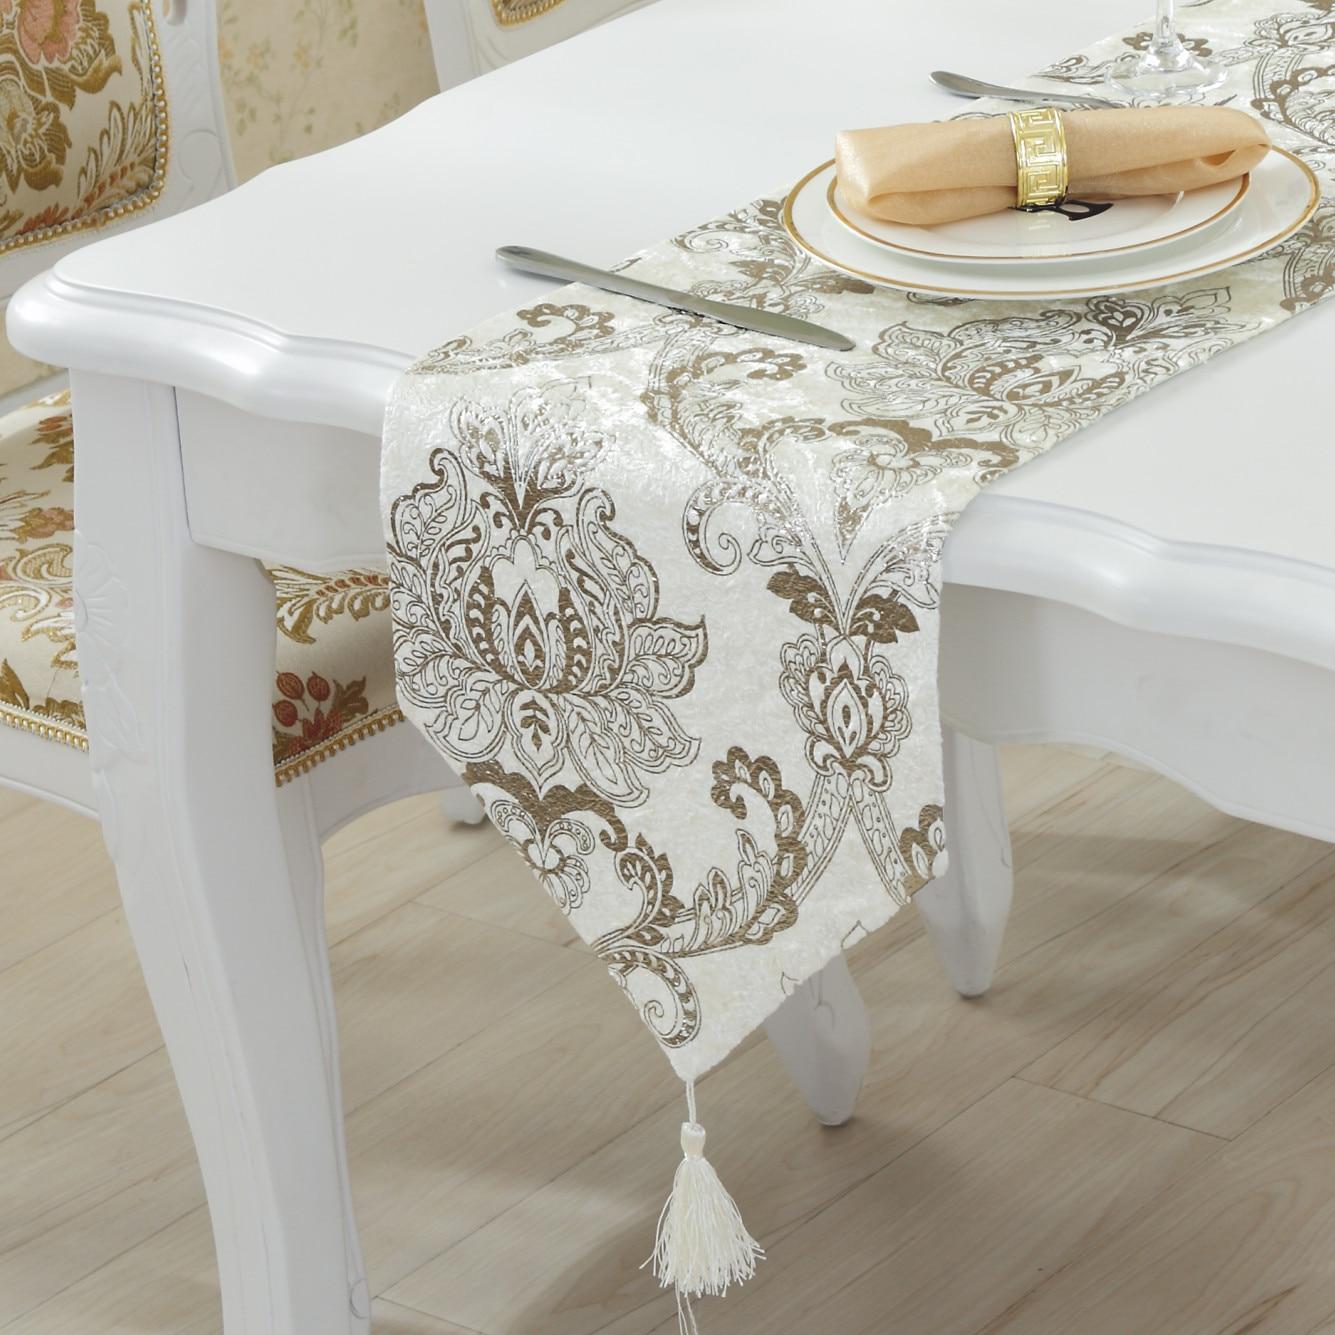 ︻European Gold Velvet Silver ⓪ Pressed Pressed Table